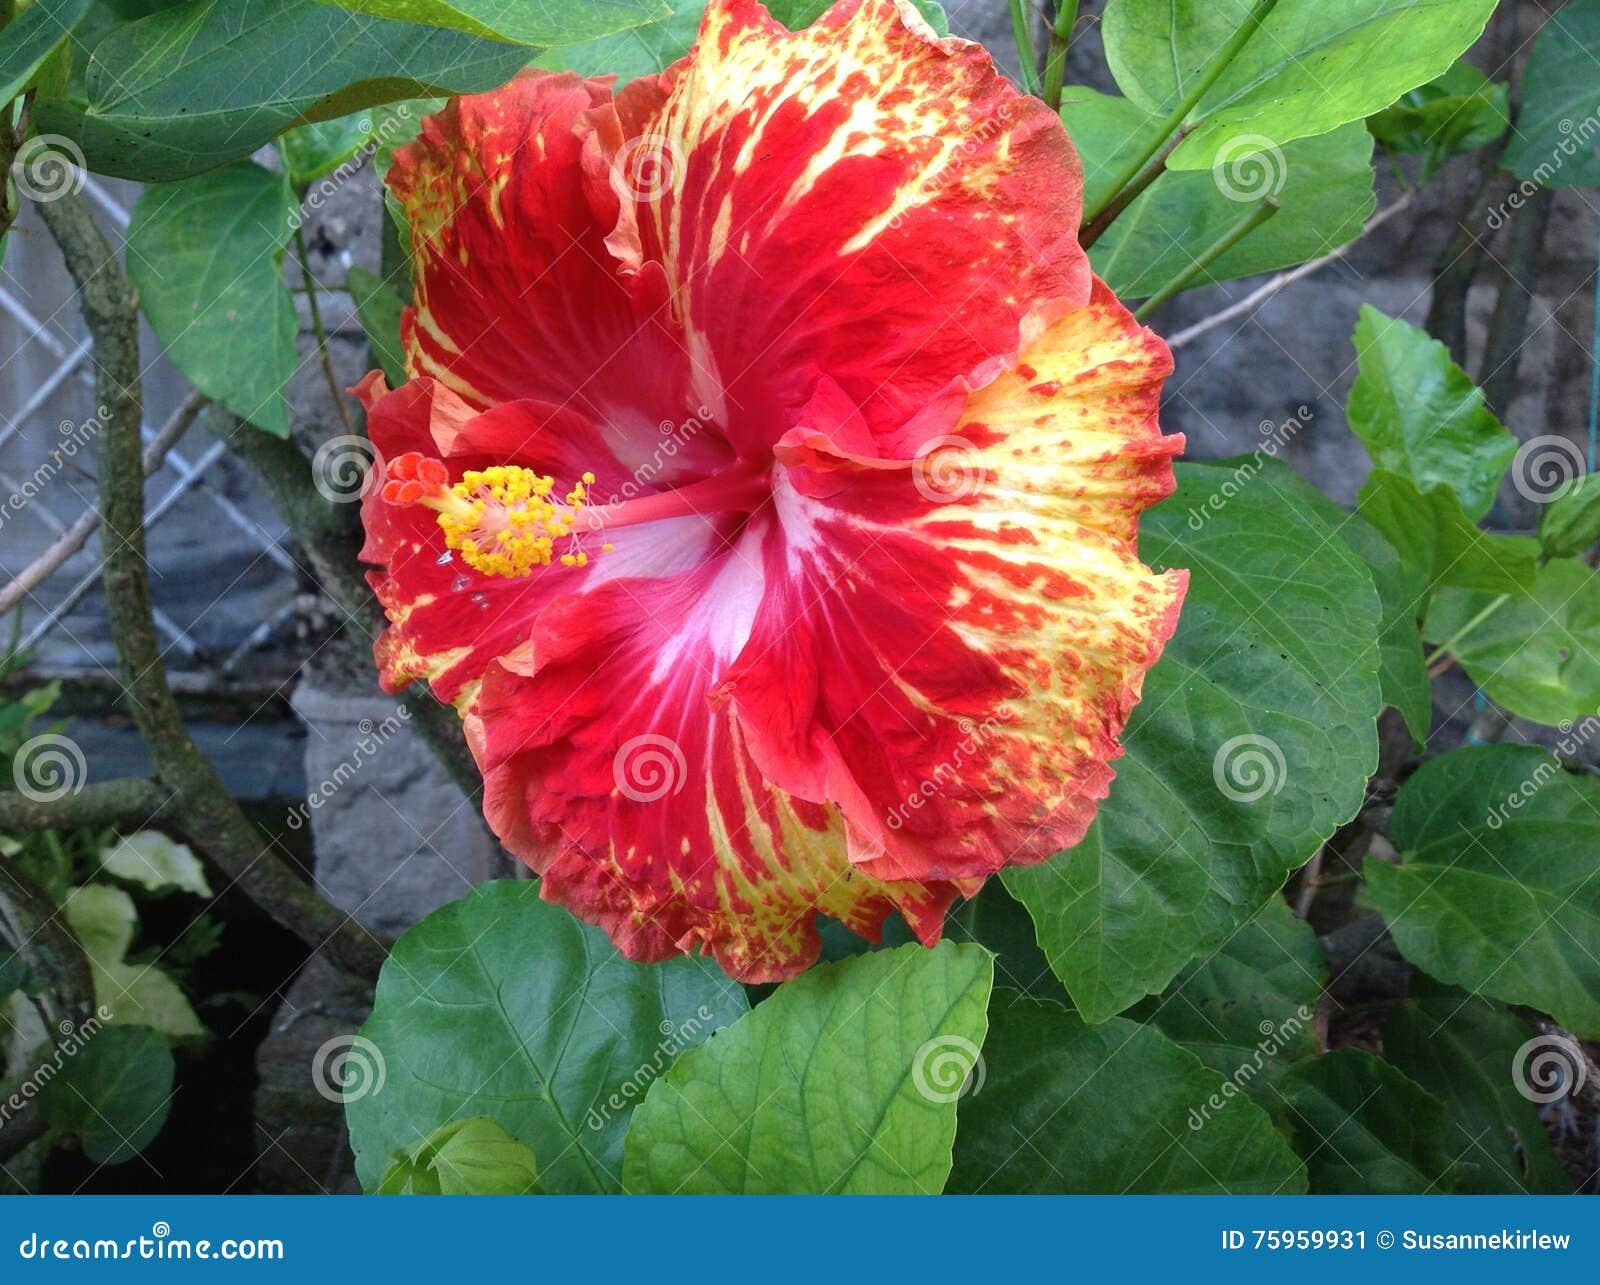 Hibiscus flower stock image image of jamaican ripe 75959931 jamaican hibiscus flower red with yellow centre izmirmasajfo